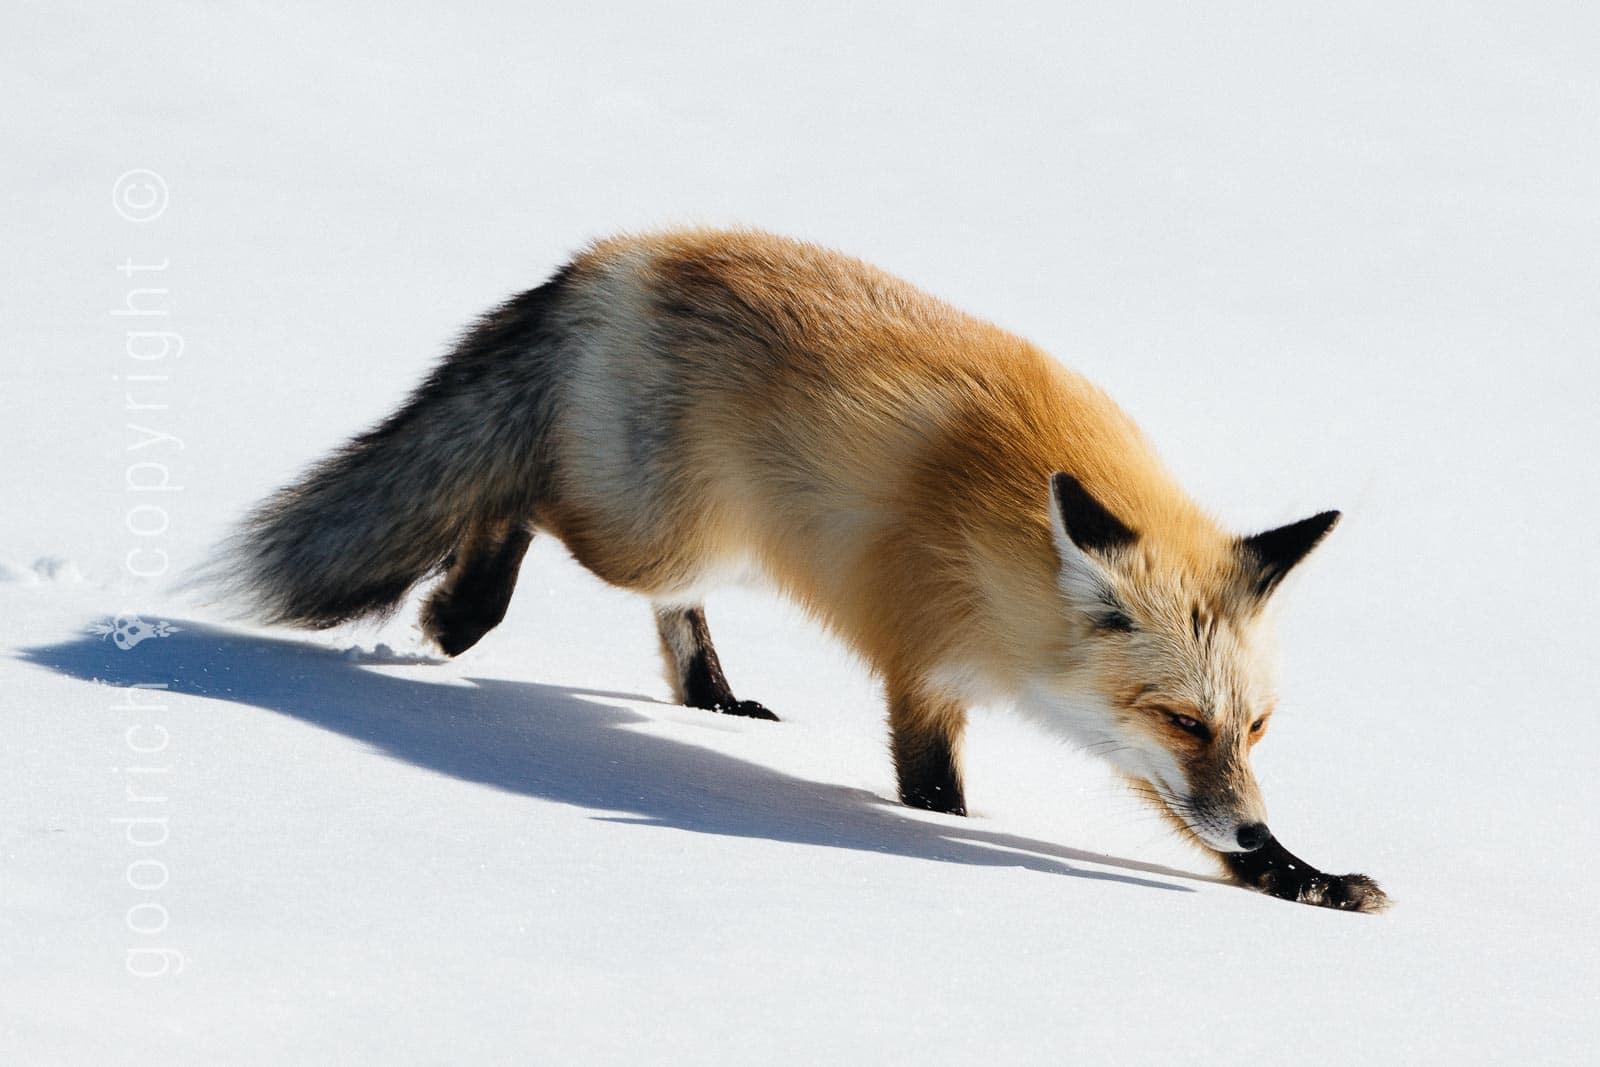 choosing the right photograph - yellowstone fox by Jay Goodrich